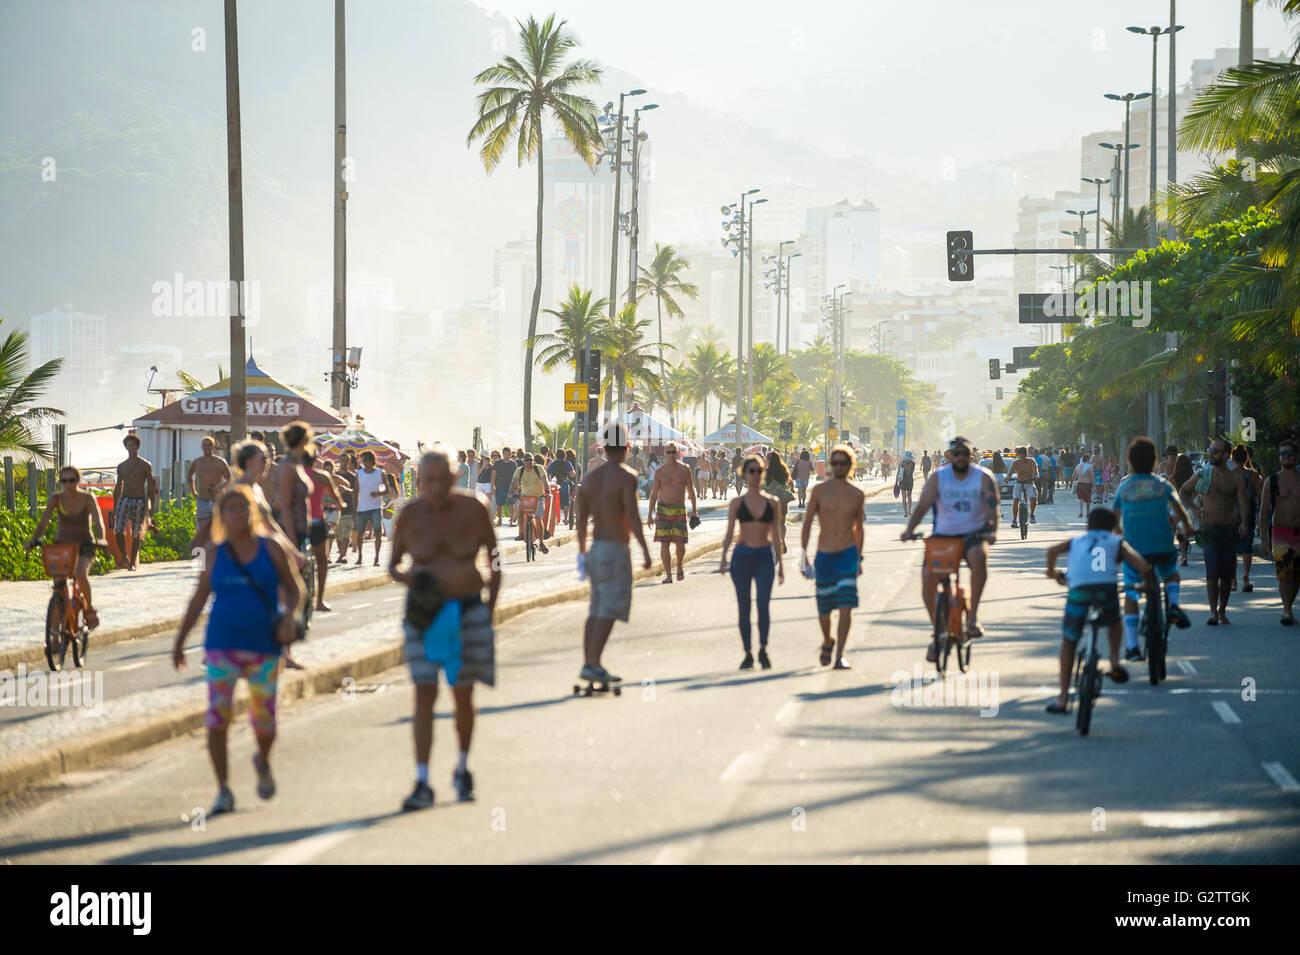 RIO DE JANEIRO - le 6 mars 2016: les piétons partagent l''Avenida Vieira Souto en front de rue Photo Stock